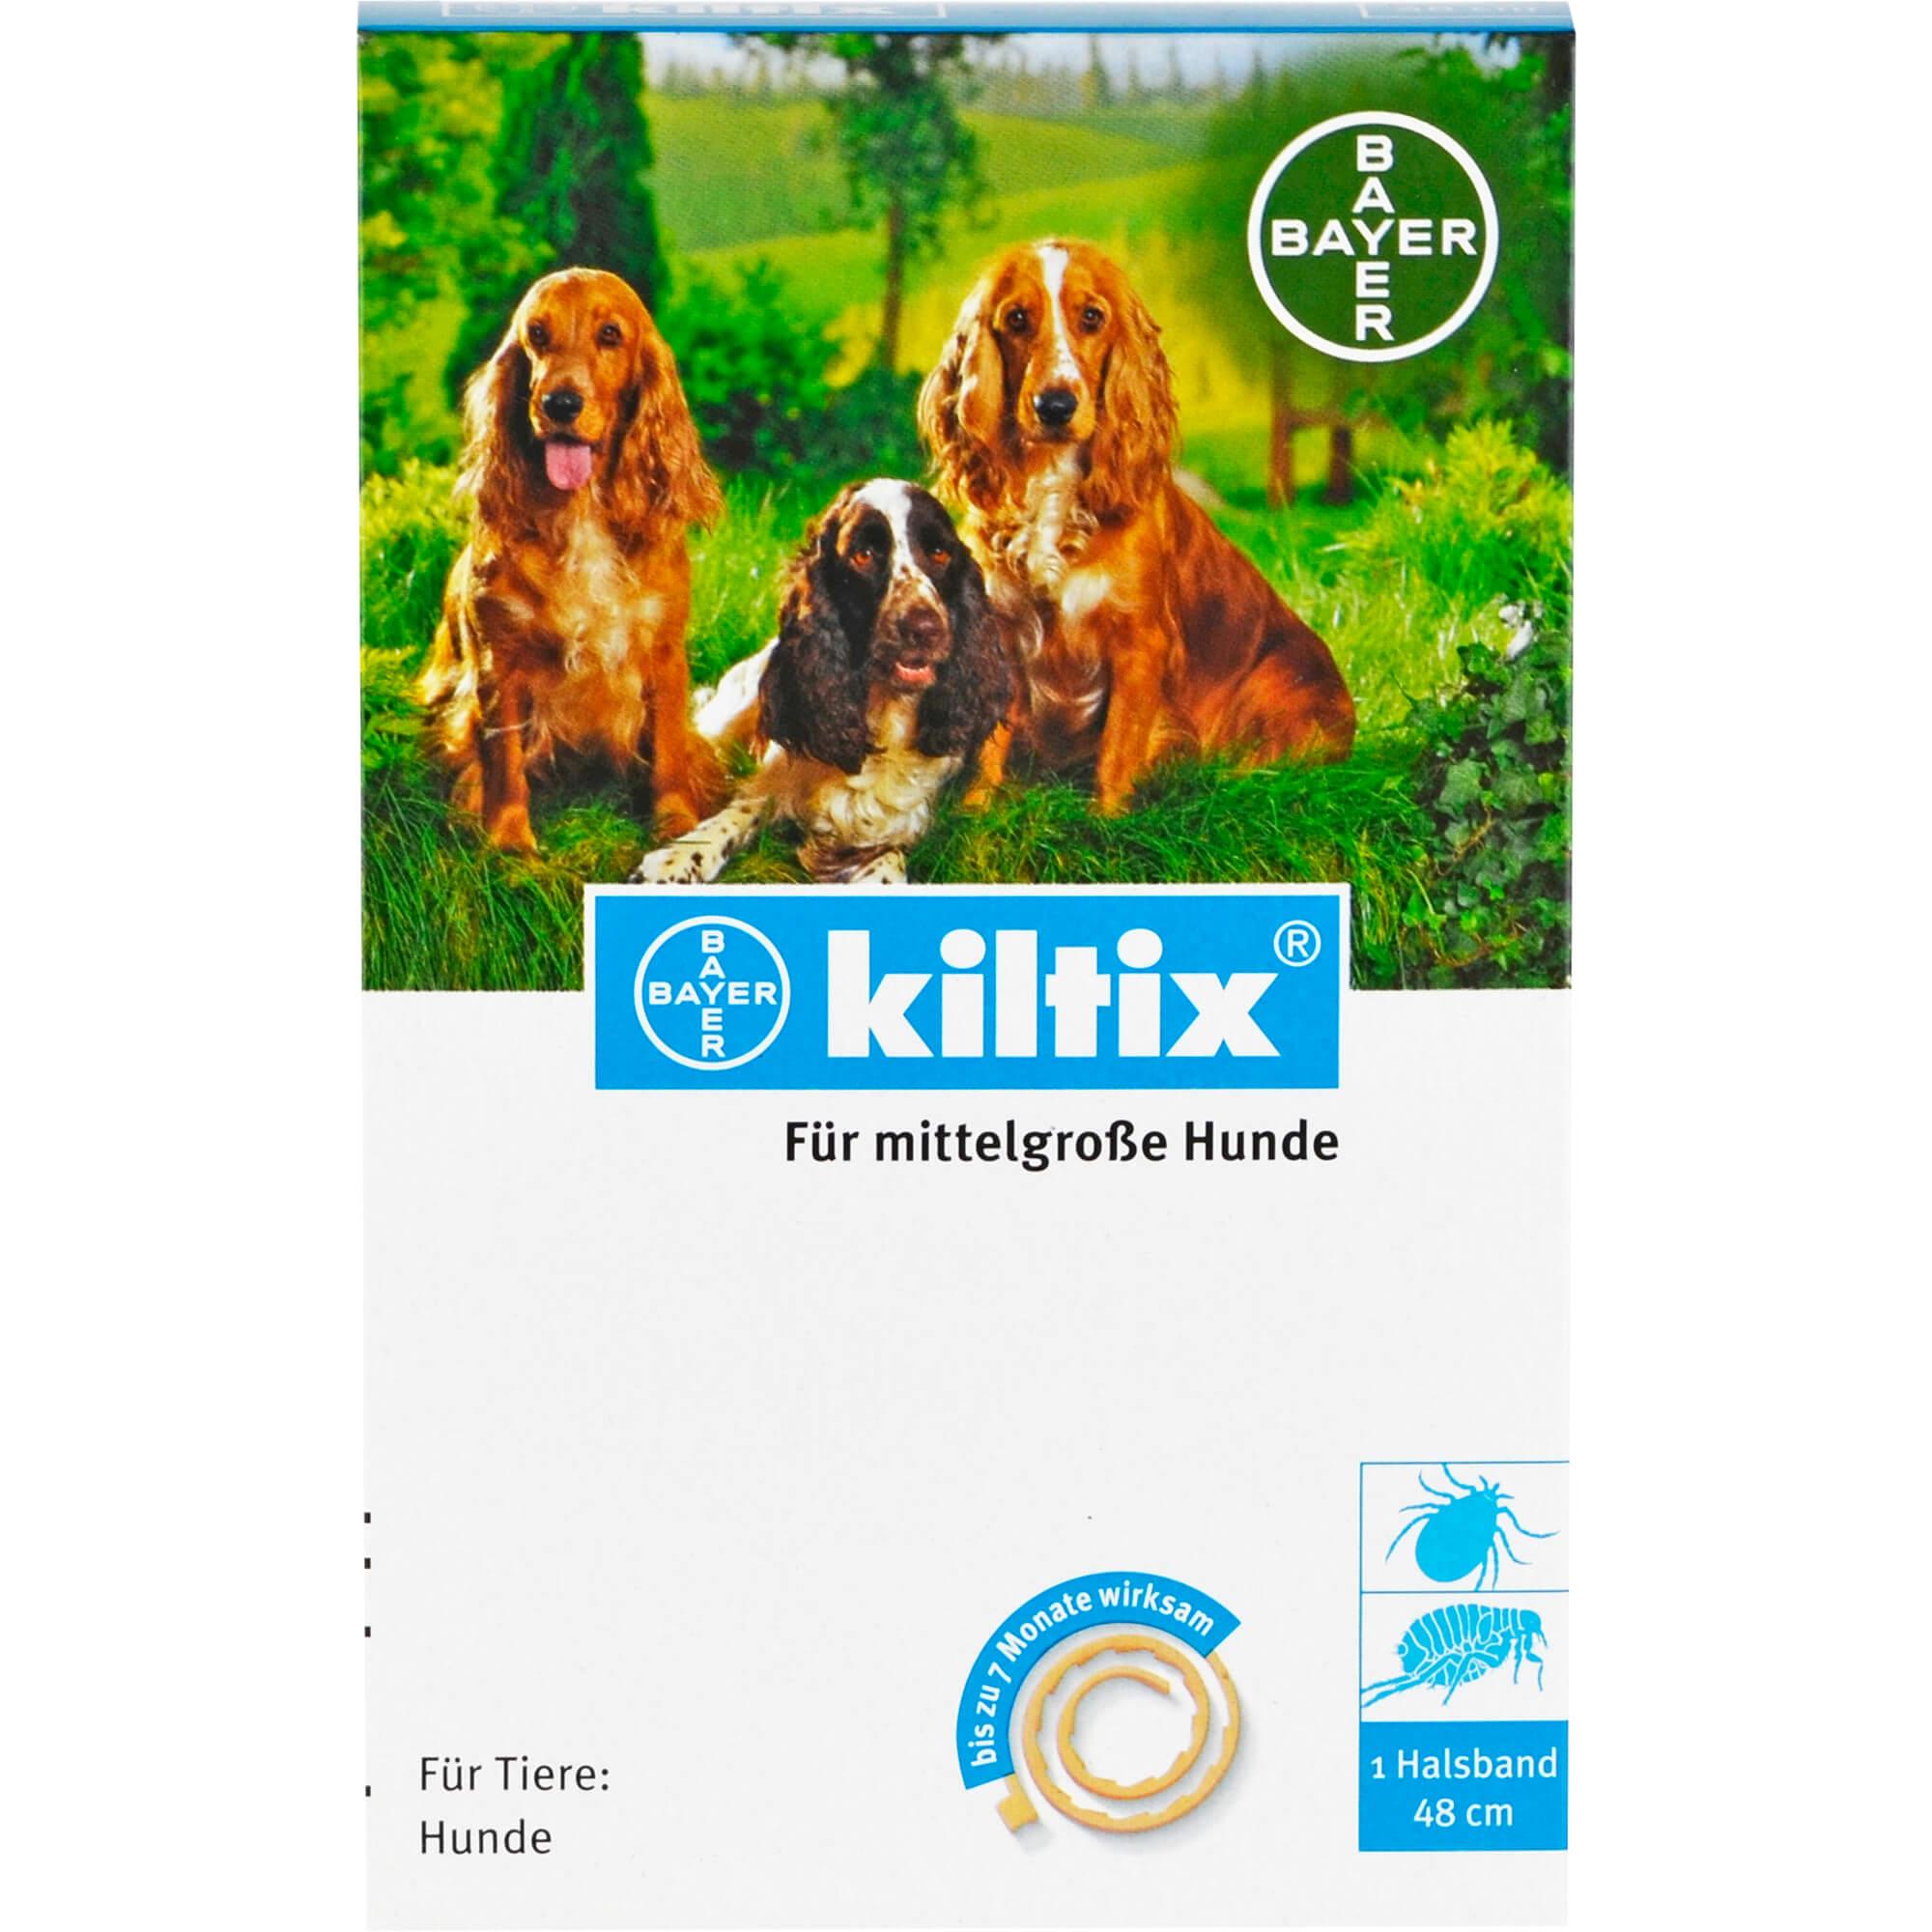 KILTIX-Halsband-f-mittelgrosse-Hunde